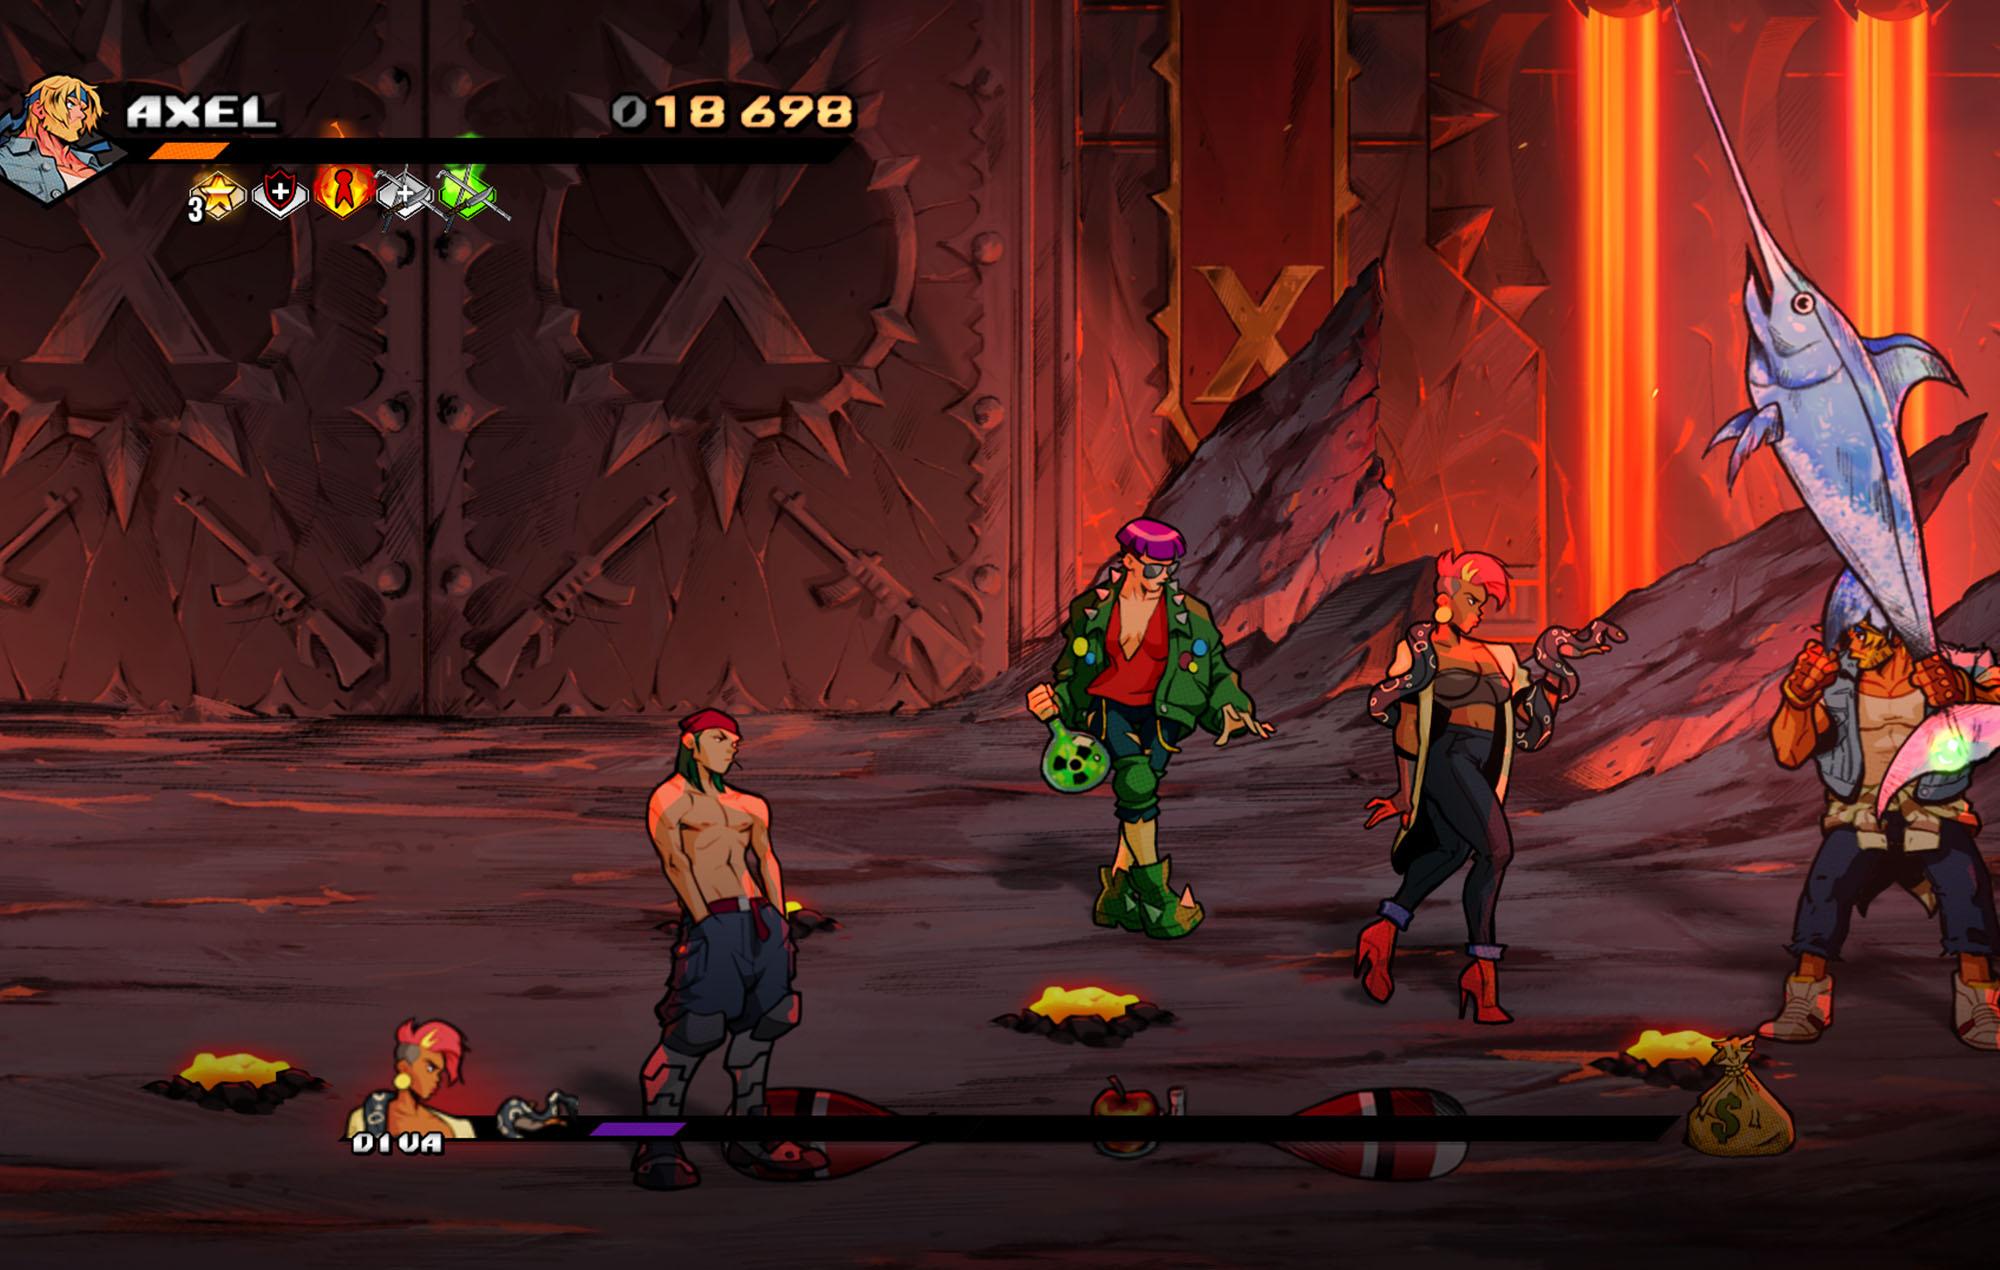 Streets of Rage 4 - Mr X Nightmare DLC